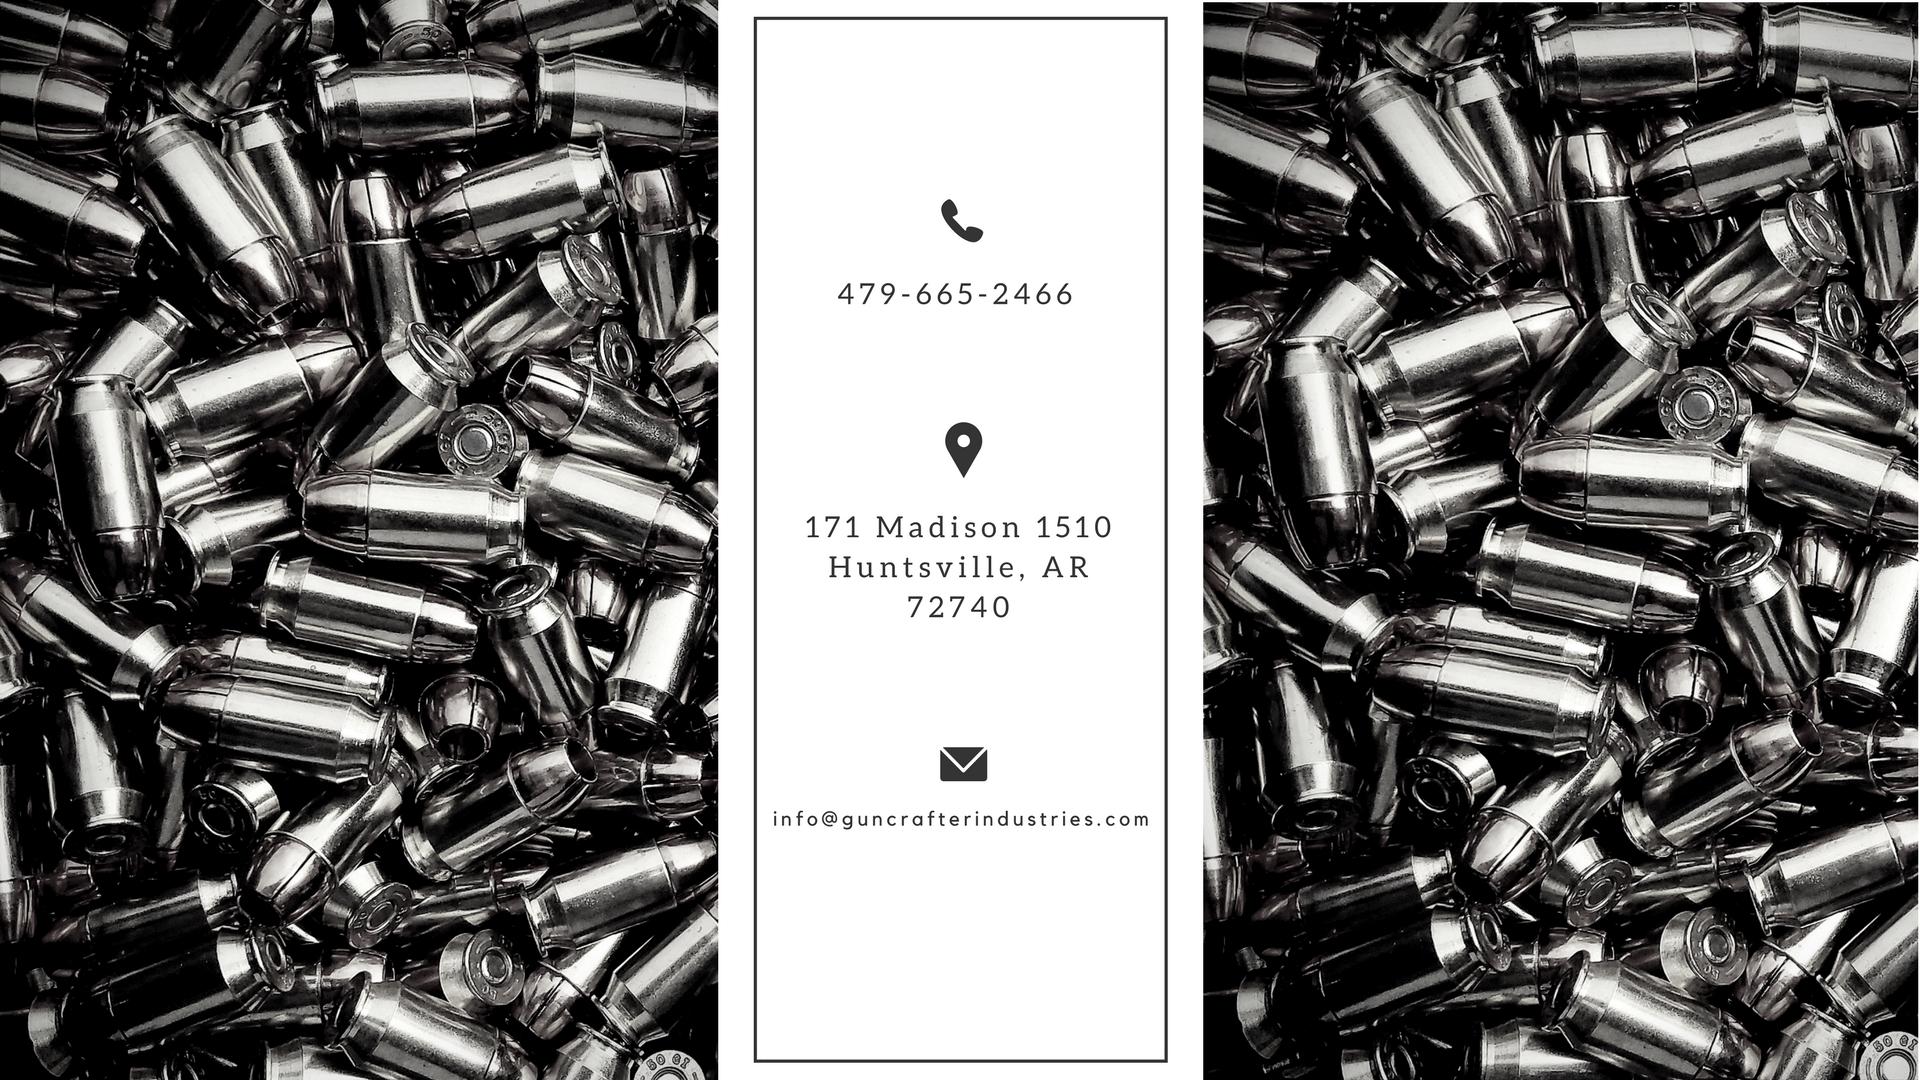 guncrafter-industries-contact-information-list-1.jpg